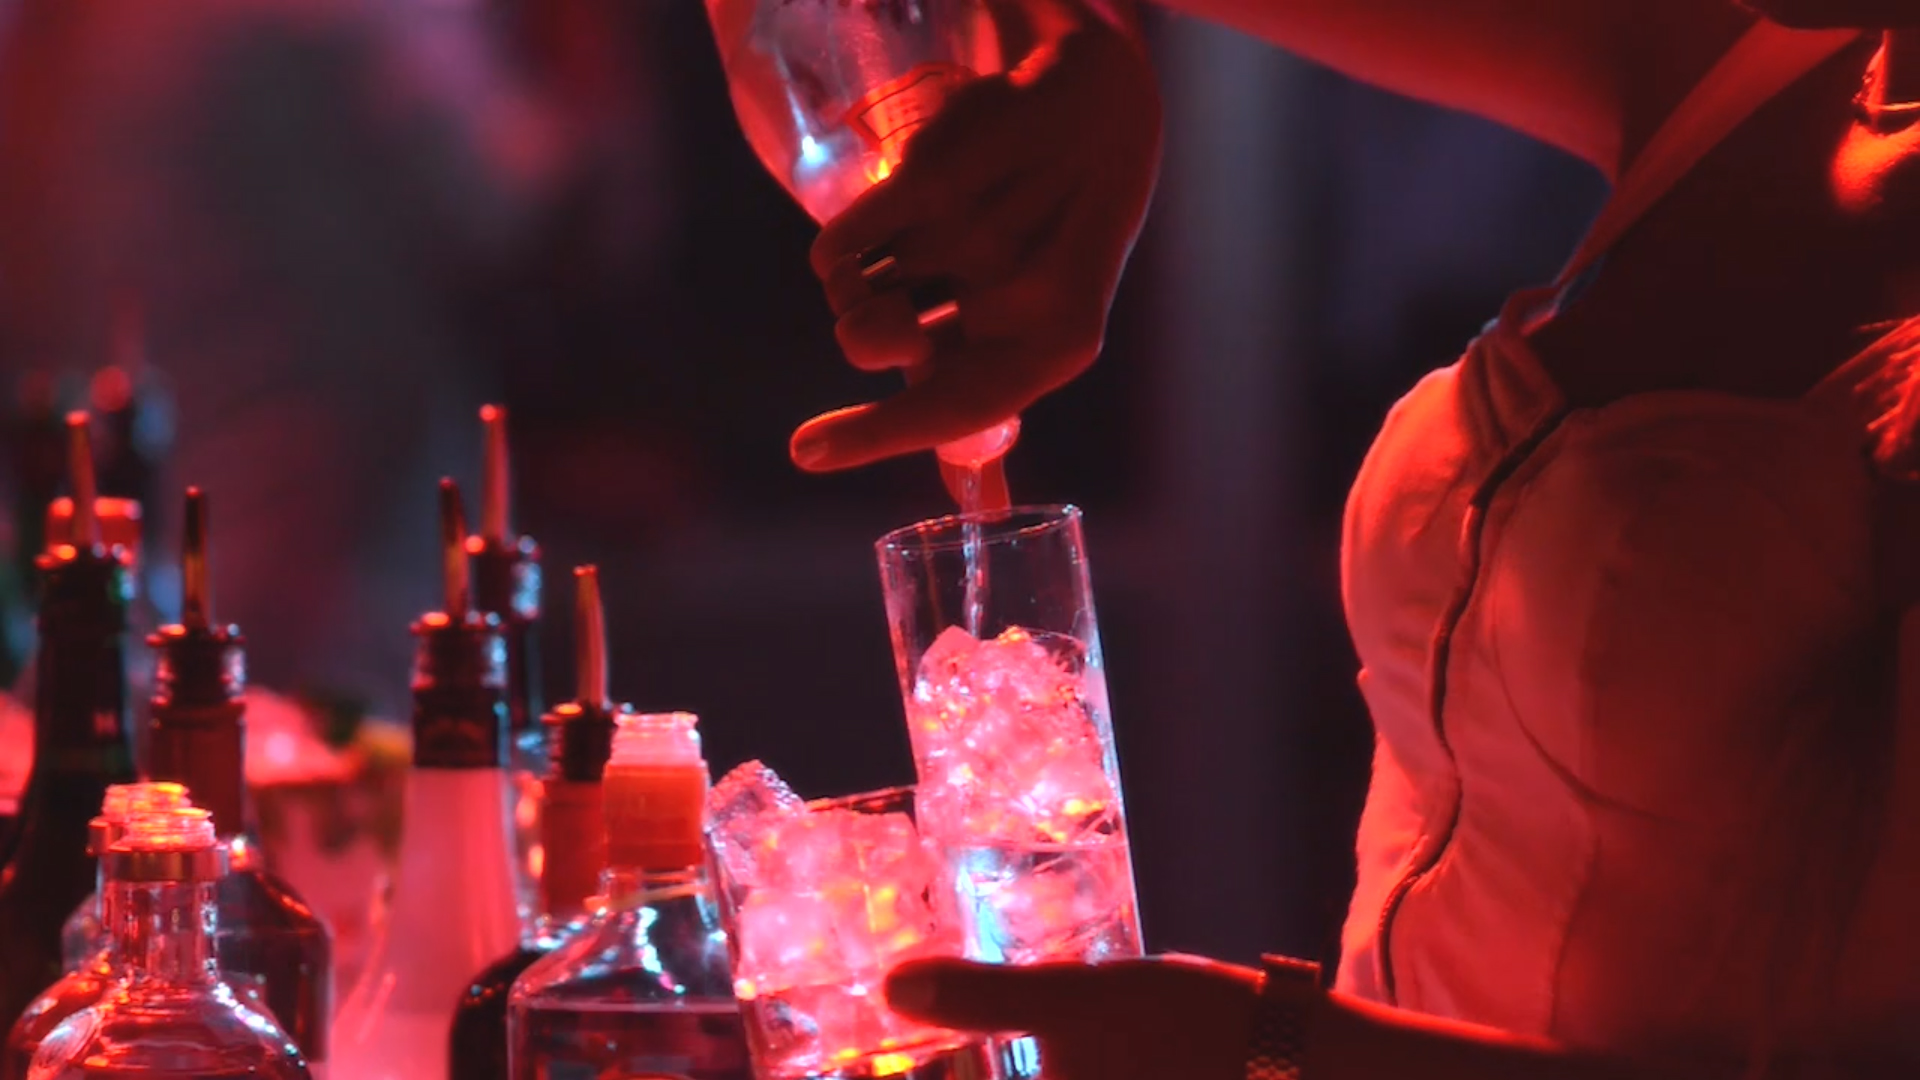 Teaser | Galea Sky Bar, Limassol